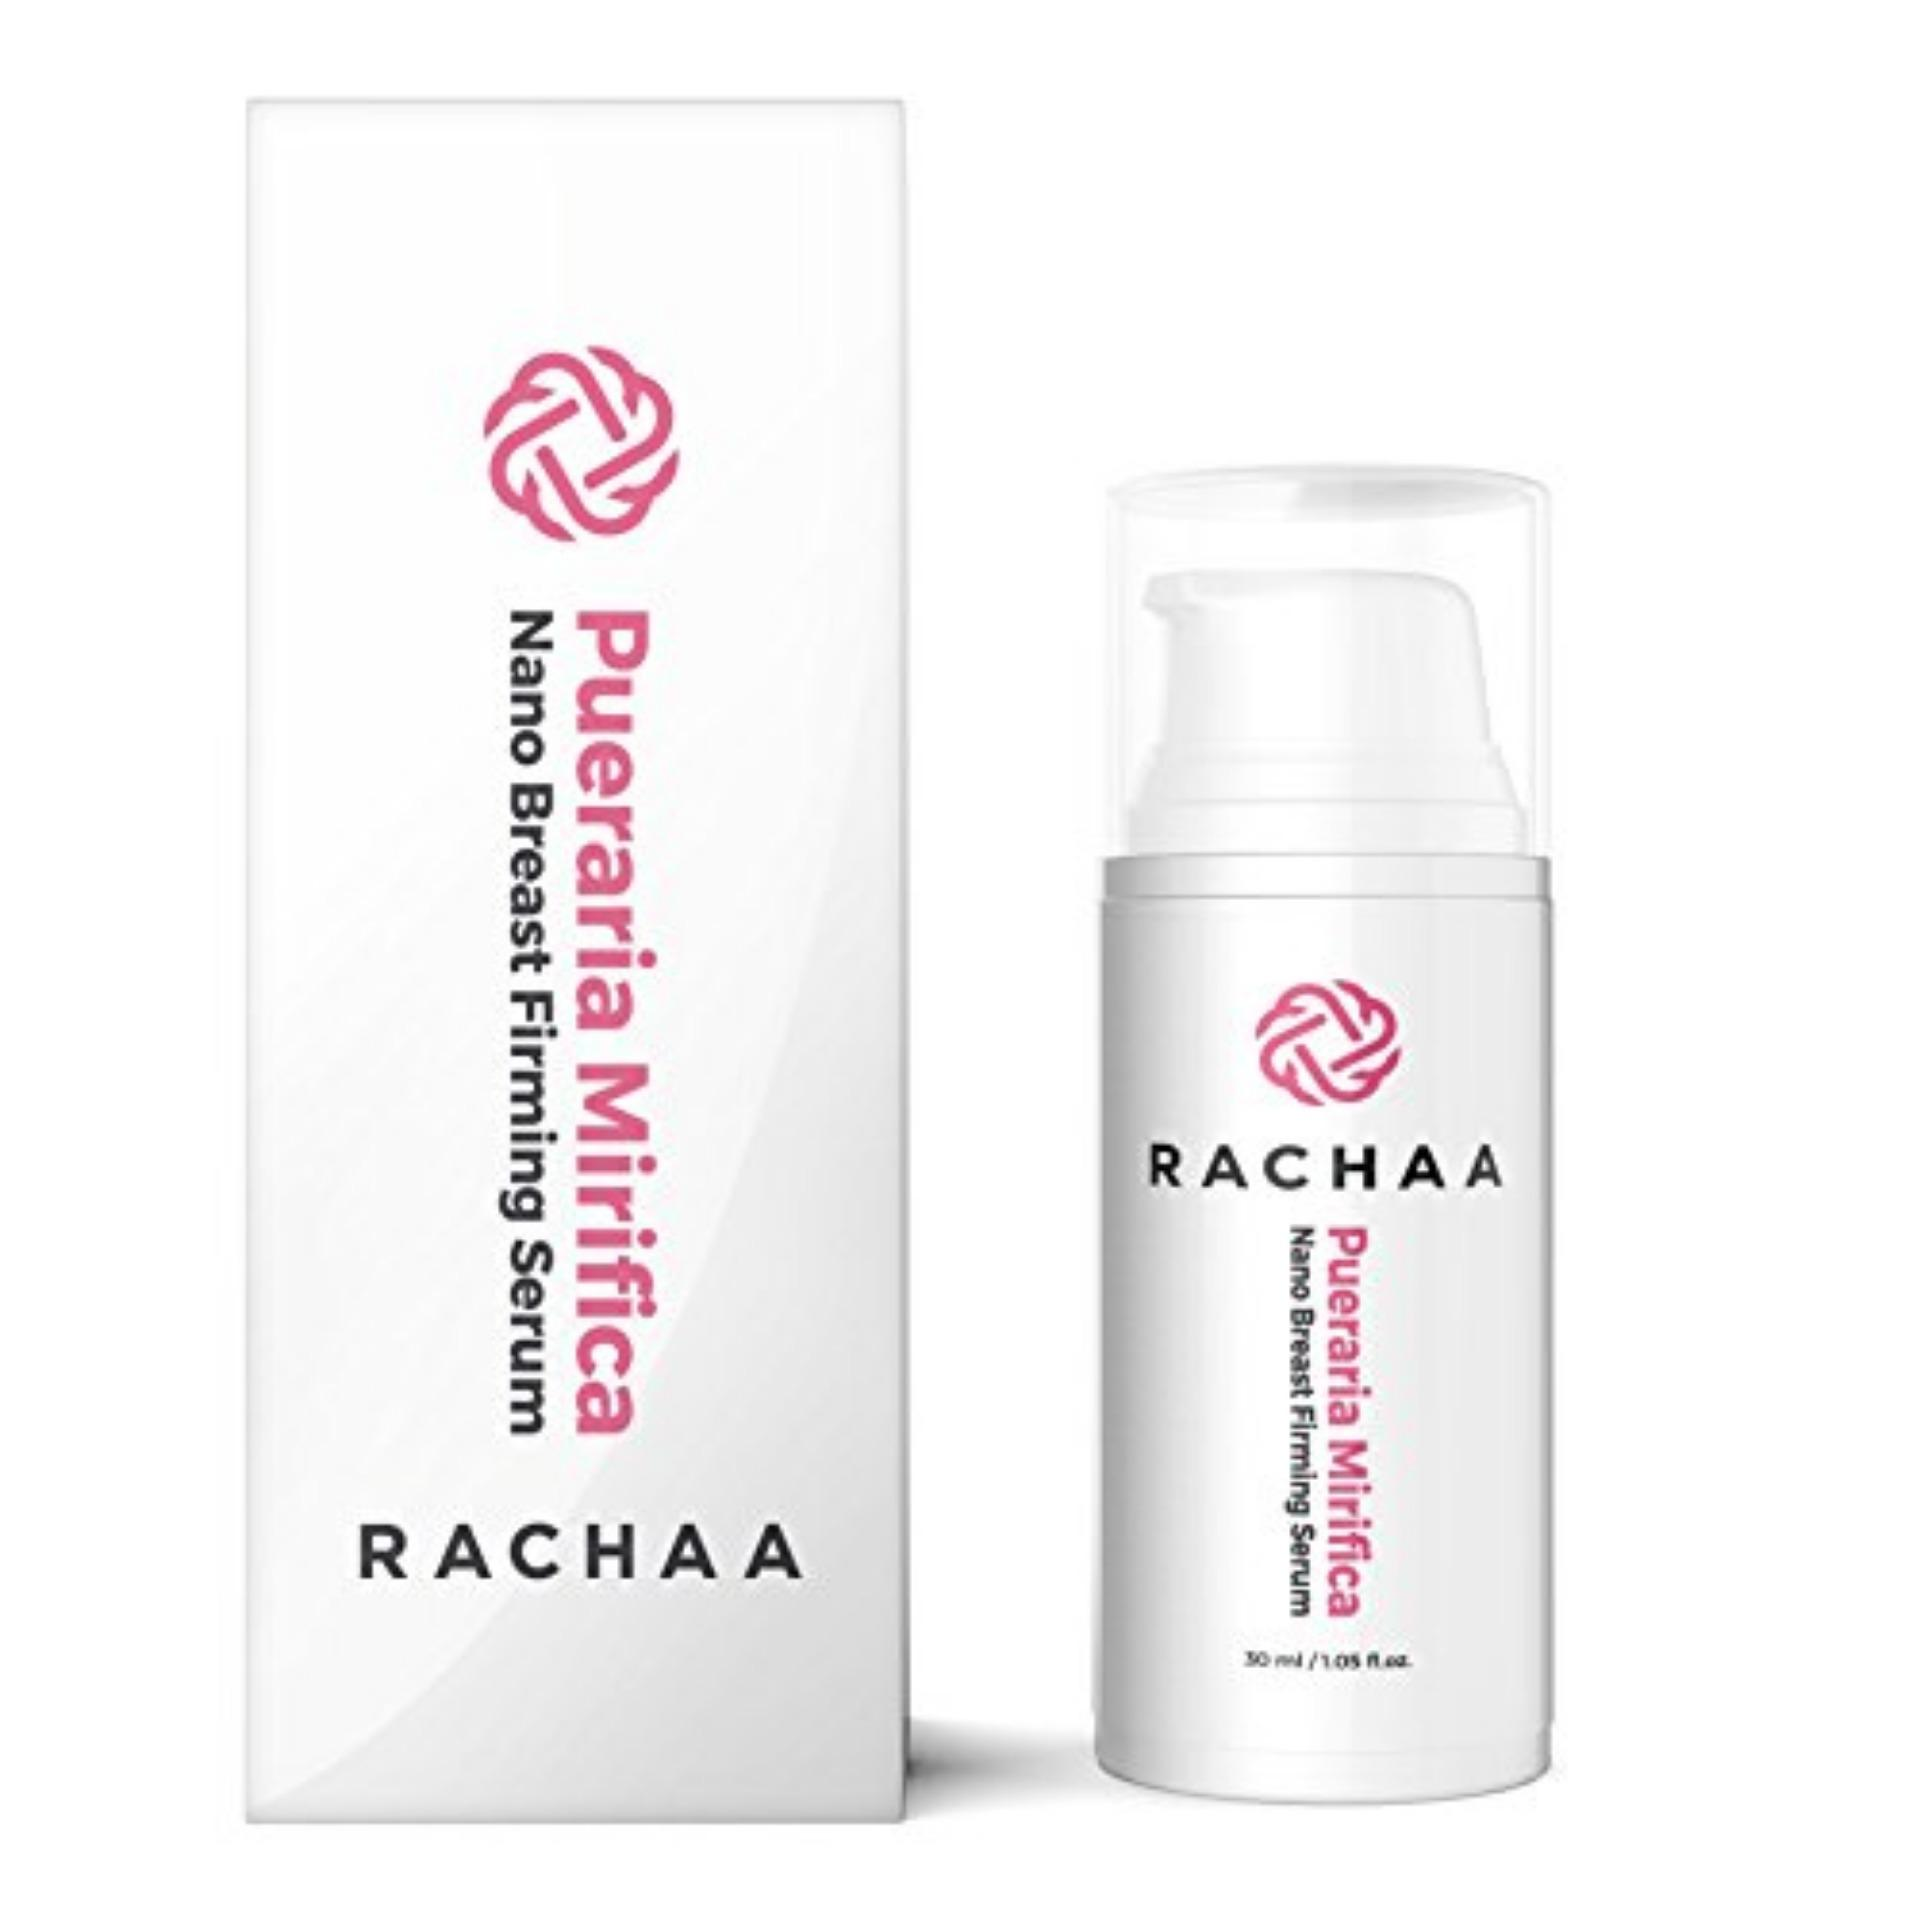 Rachaa Pueraria Mirifica Nano Breast Firming Serum for BreastContouring & Firming 30ml